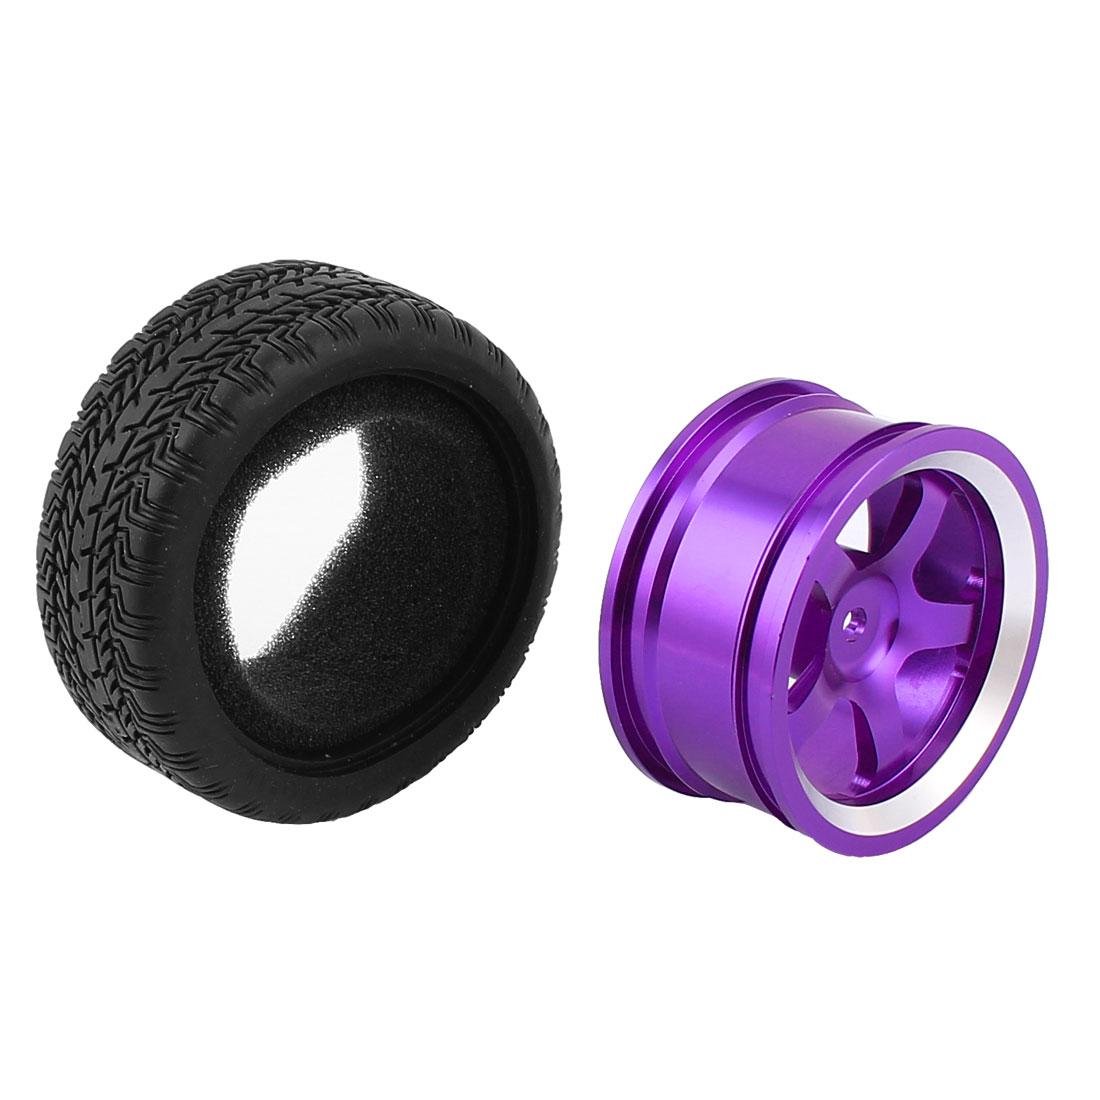 Aluminium Alloy Purple Wheel Rim w Rubber Tyre for Racing Car